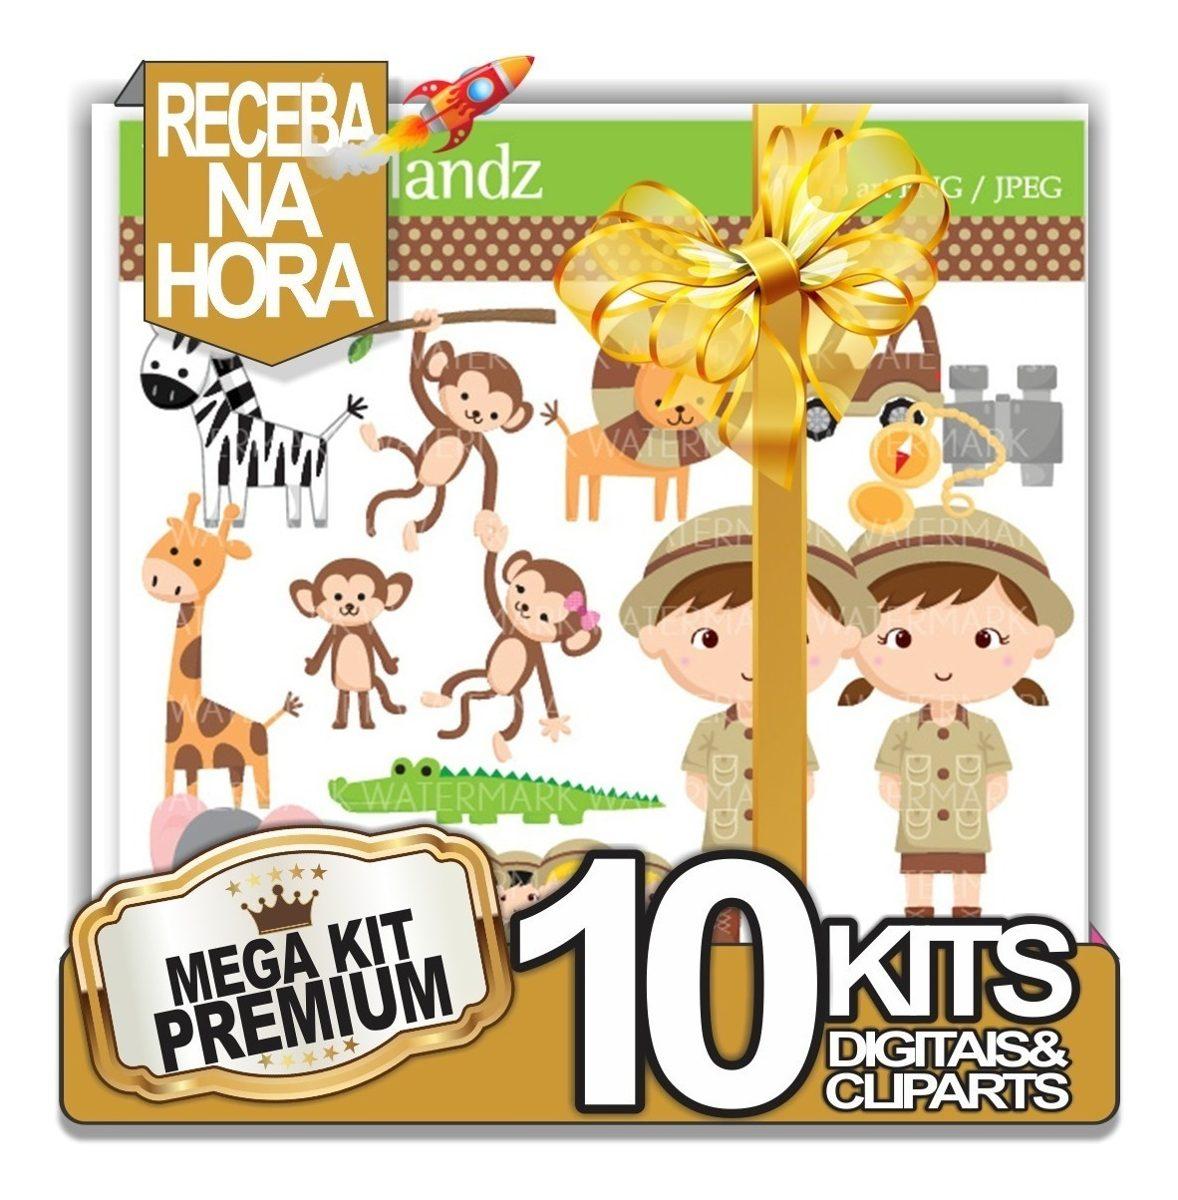 Jpeg ou clipart qual melhor picture royalty free download Safari Animais Imagens Jpg E Png Para Arte Personalizada picture royalty free download